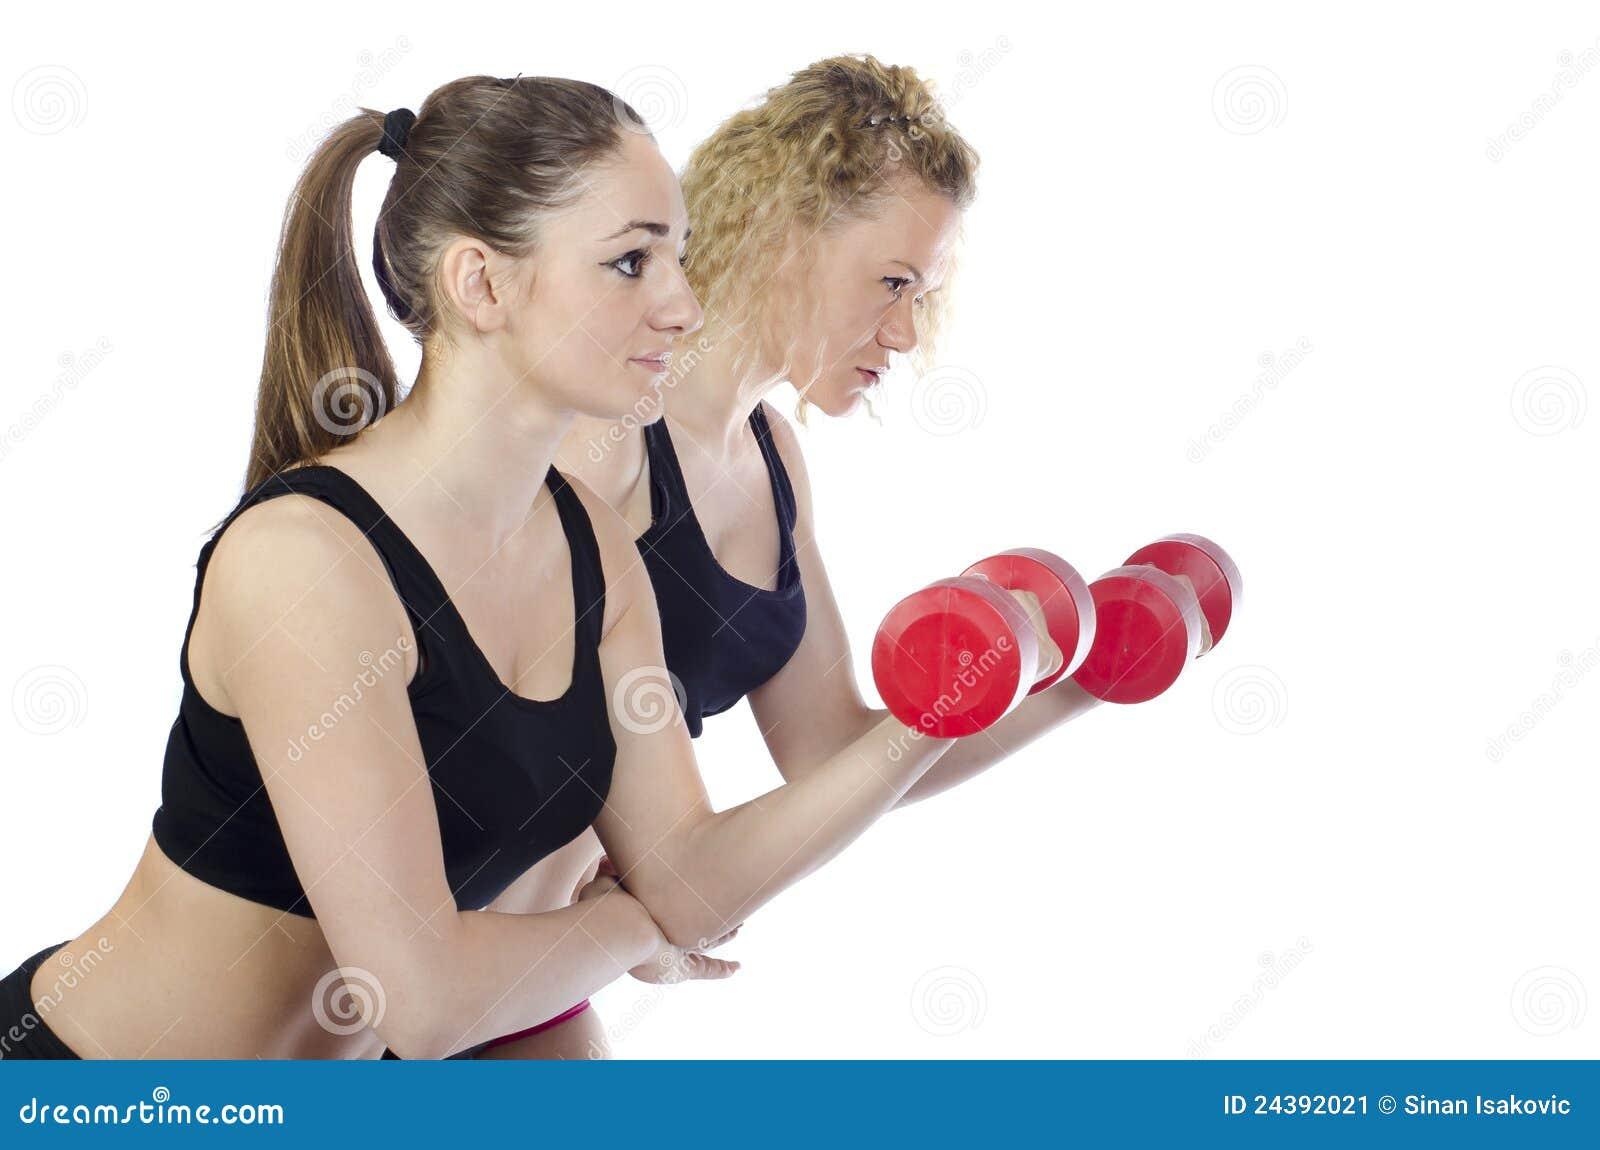 Start Your Own Profitable Fitness Center Business!